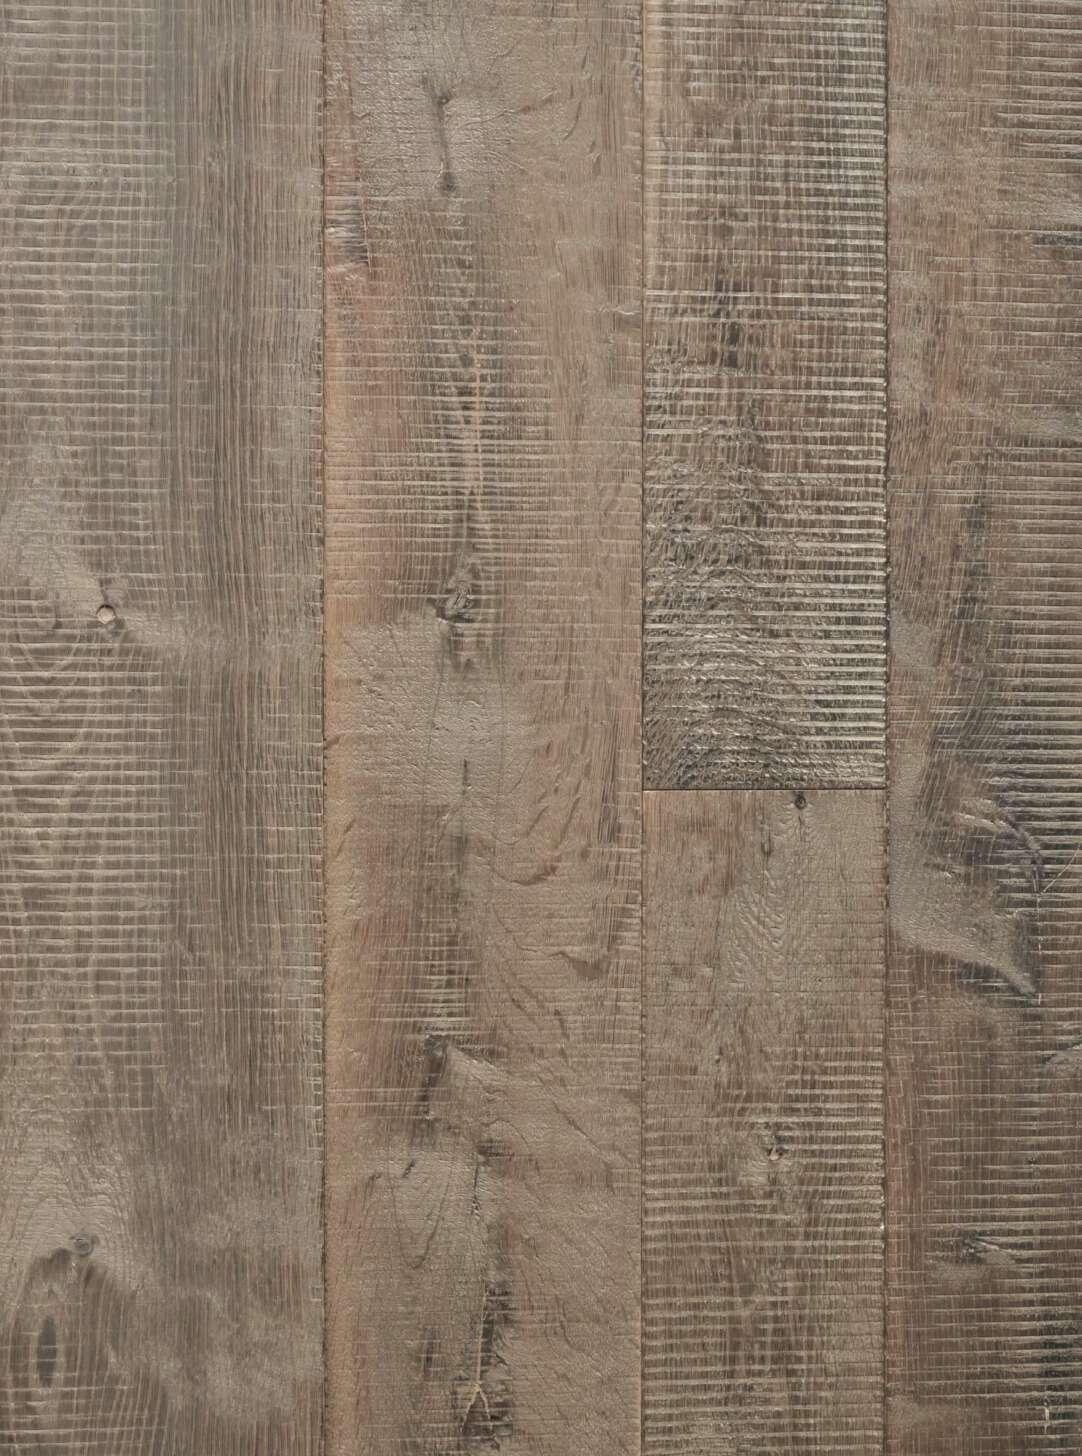 oak citadel grey textured floor with bandsaw marks